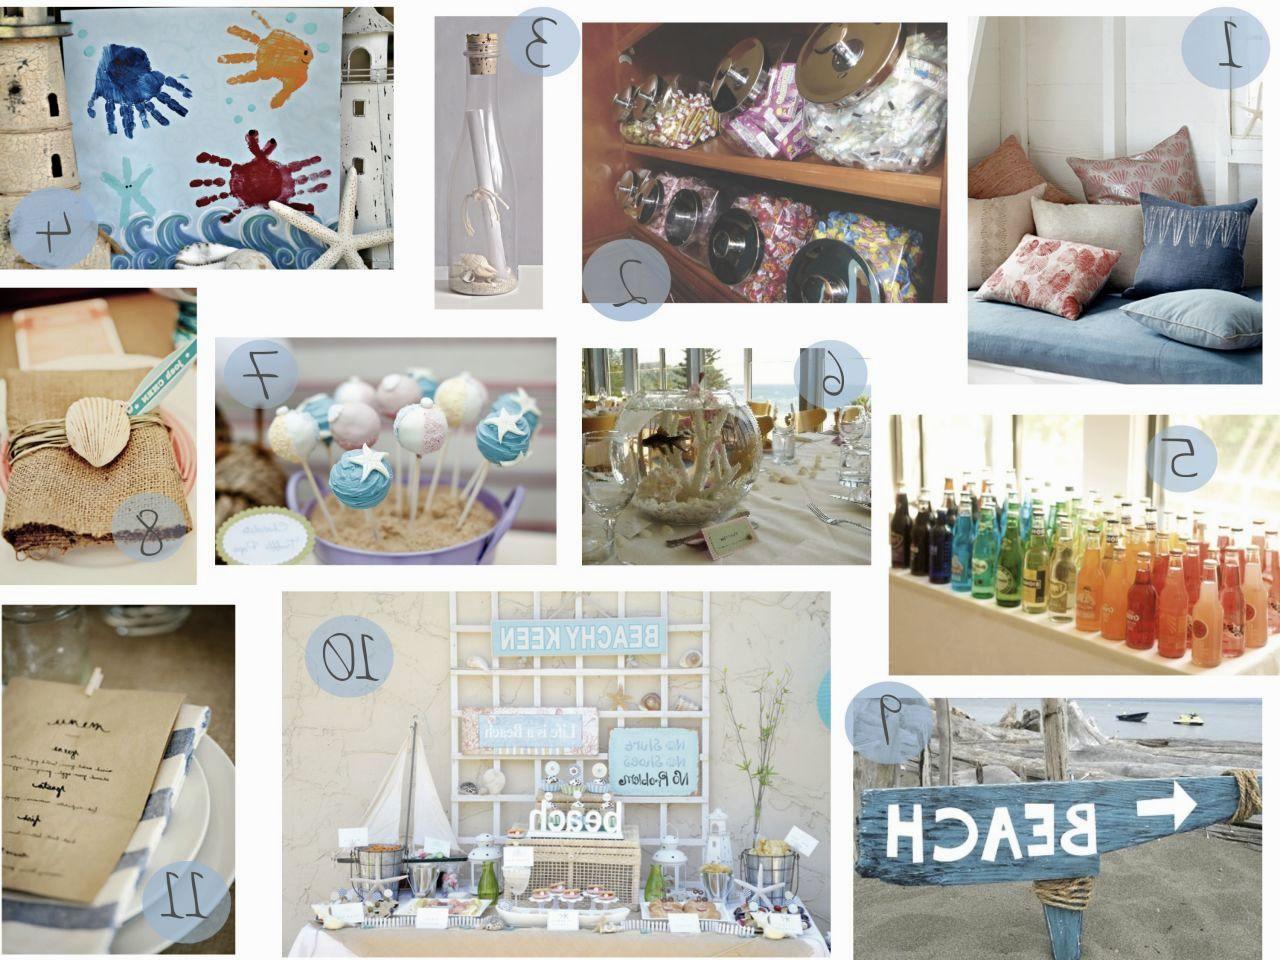 Beach Theme Party Decorations Ideas Part - 43: DIY Beach Theme Party Decorations Ideas